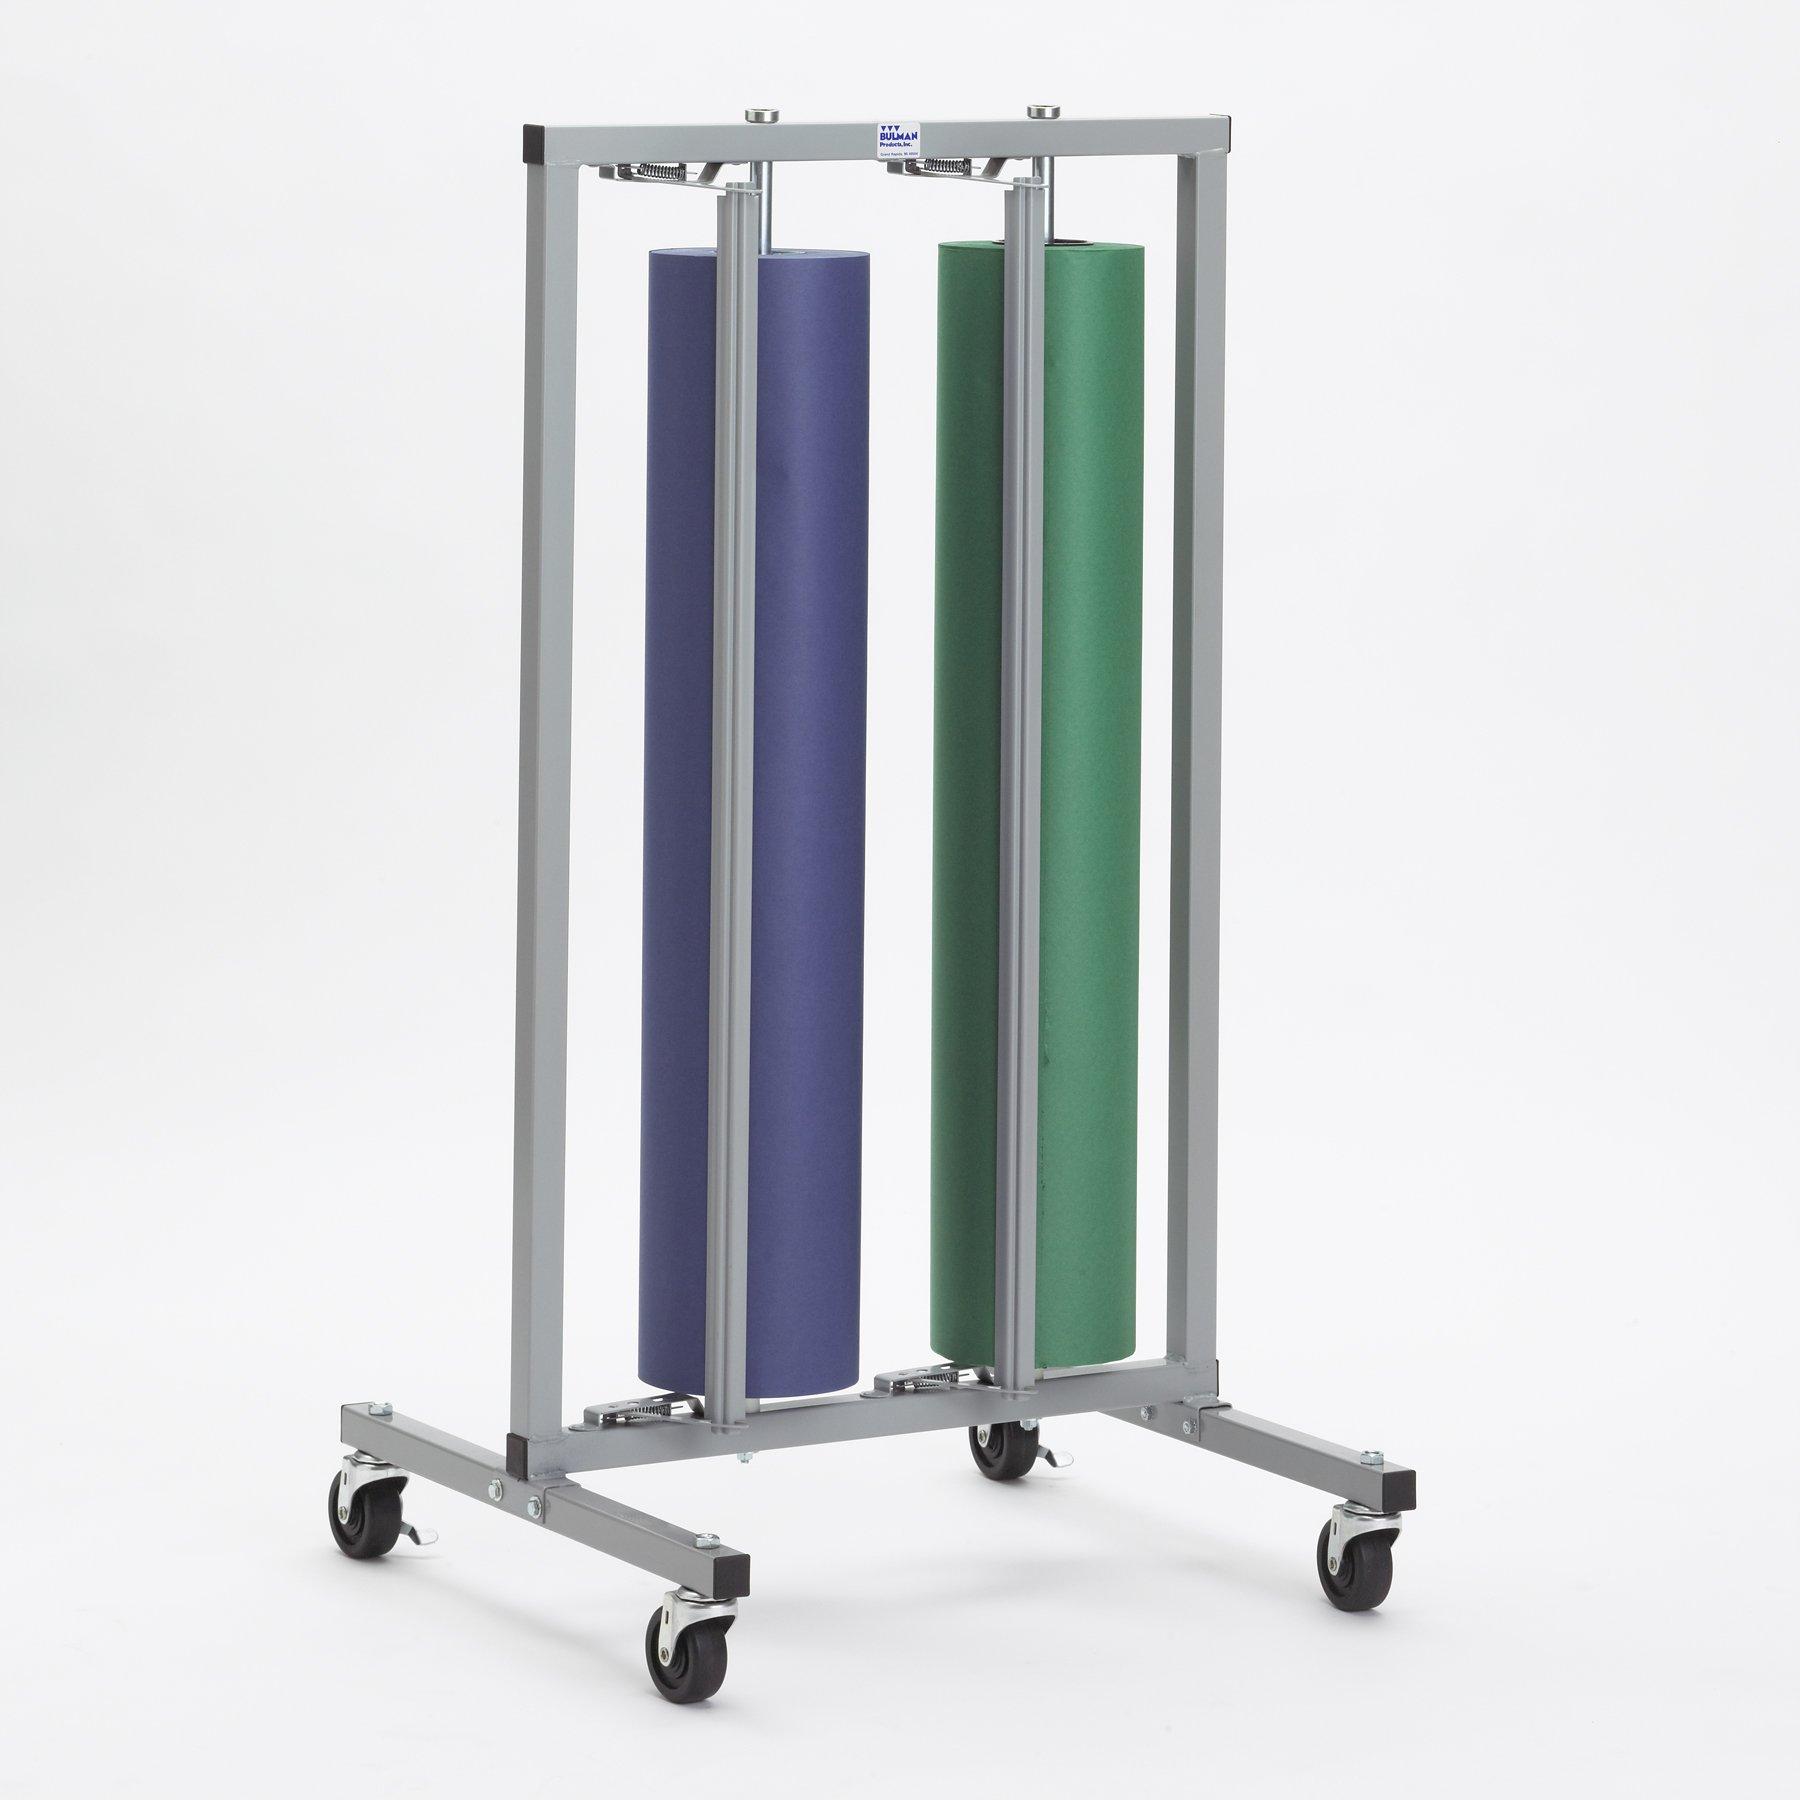 Double Paper Roll Vertical Paper Rack Dispenser 36'' for 30'', 36'' - Bulman-R997-36-No Casters